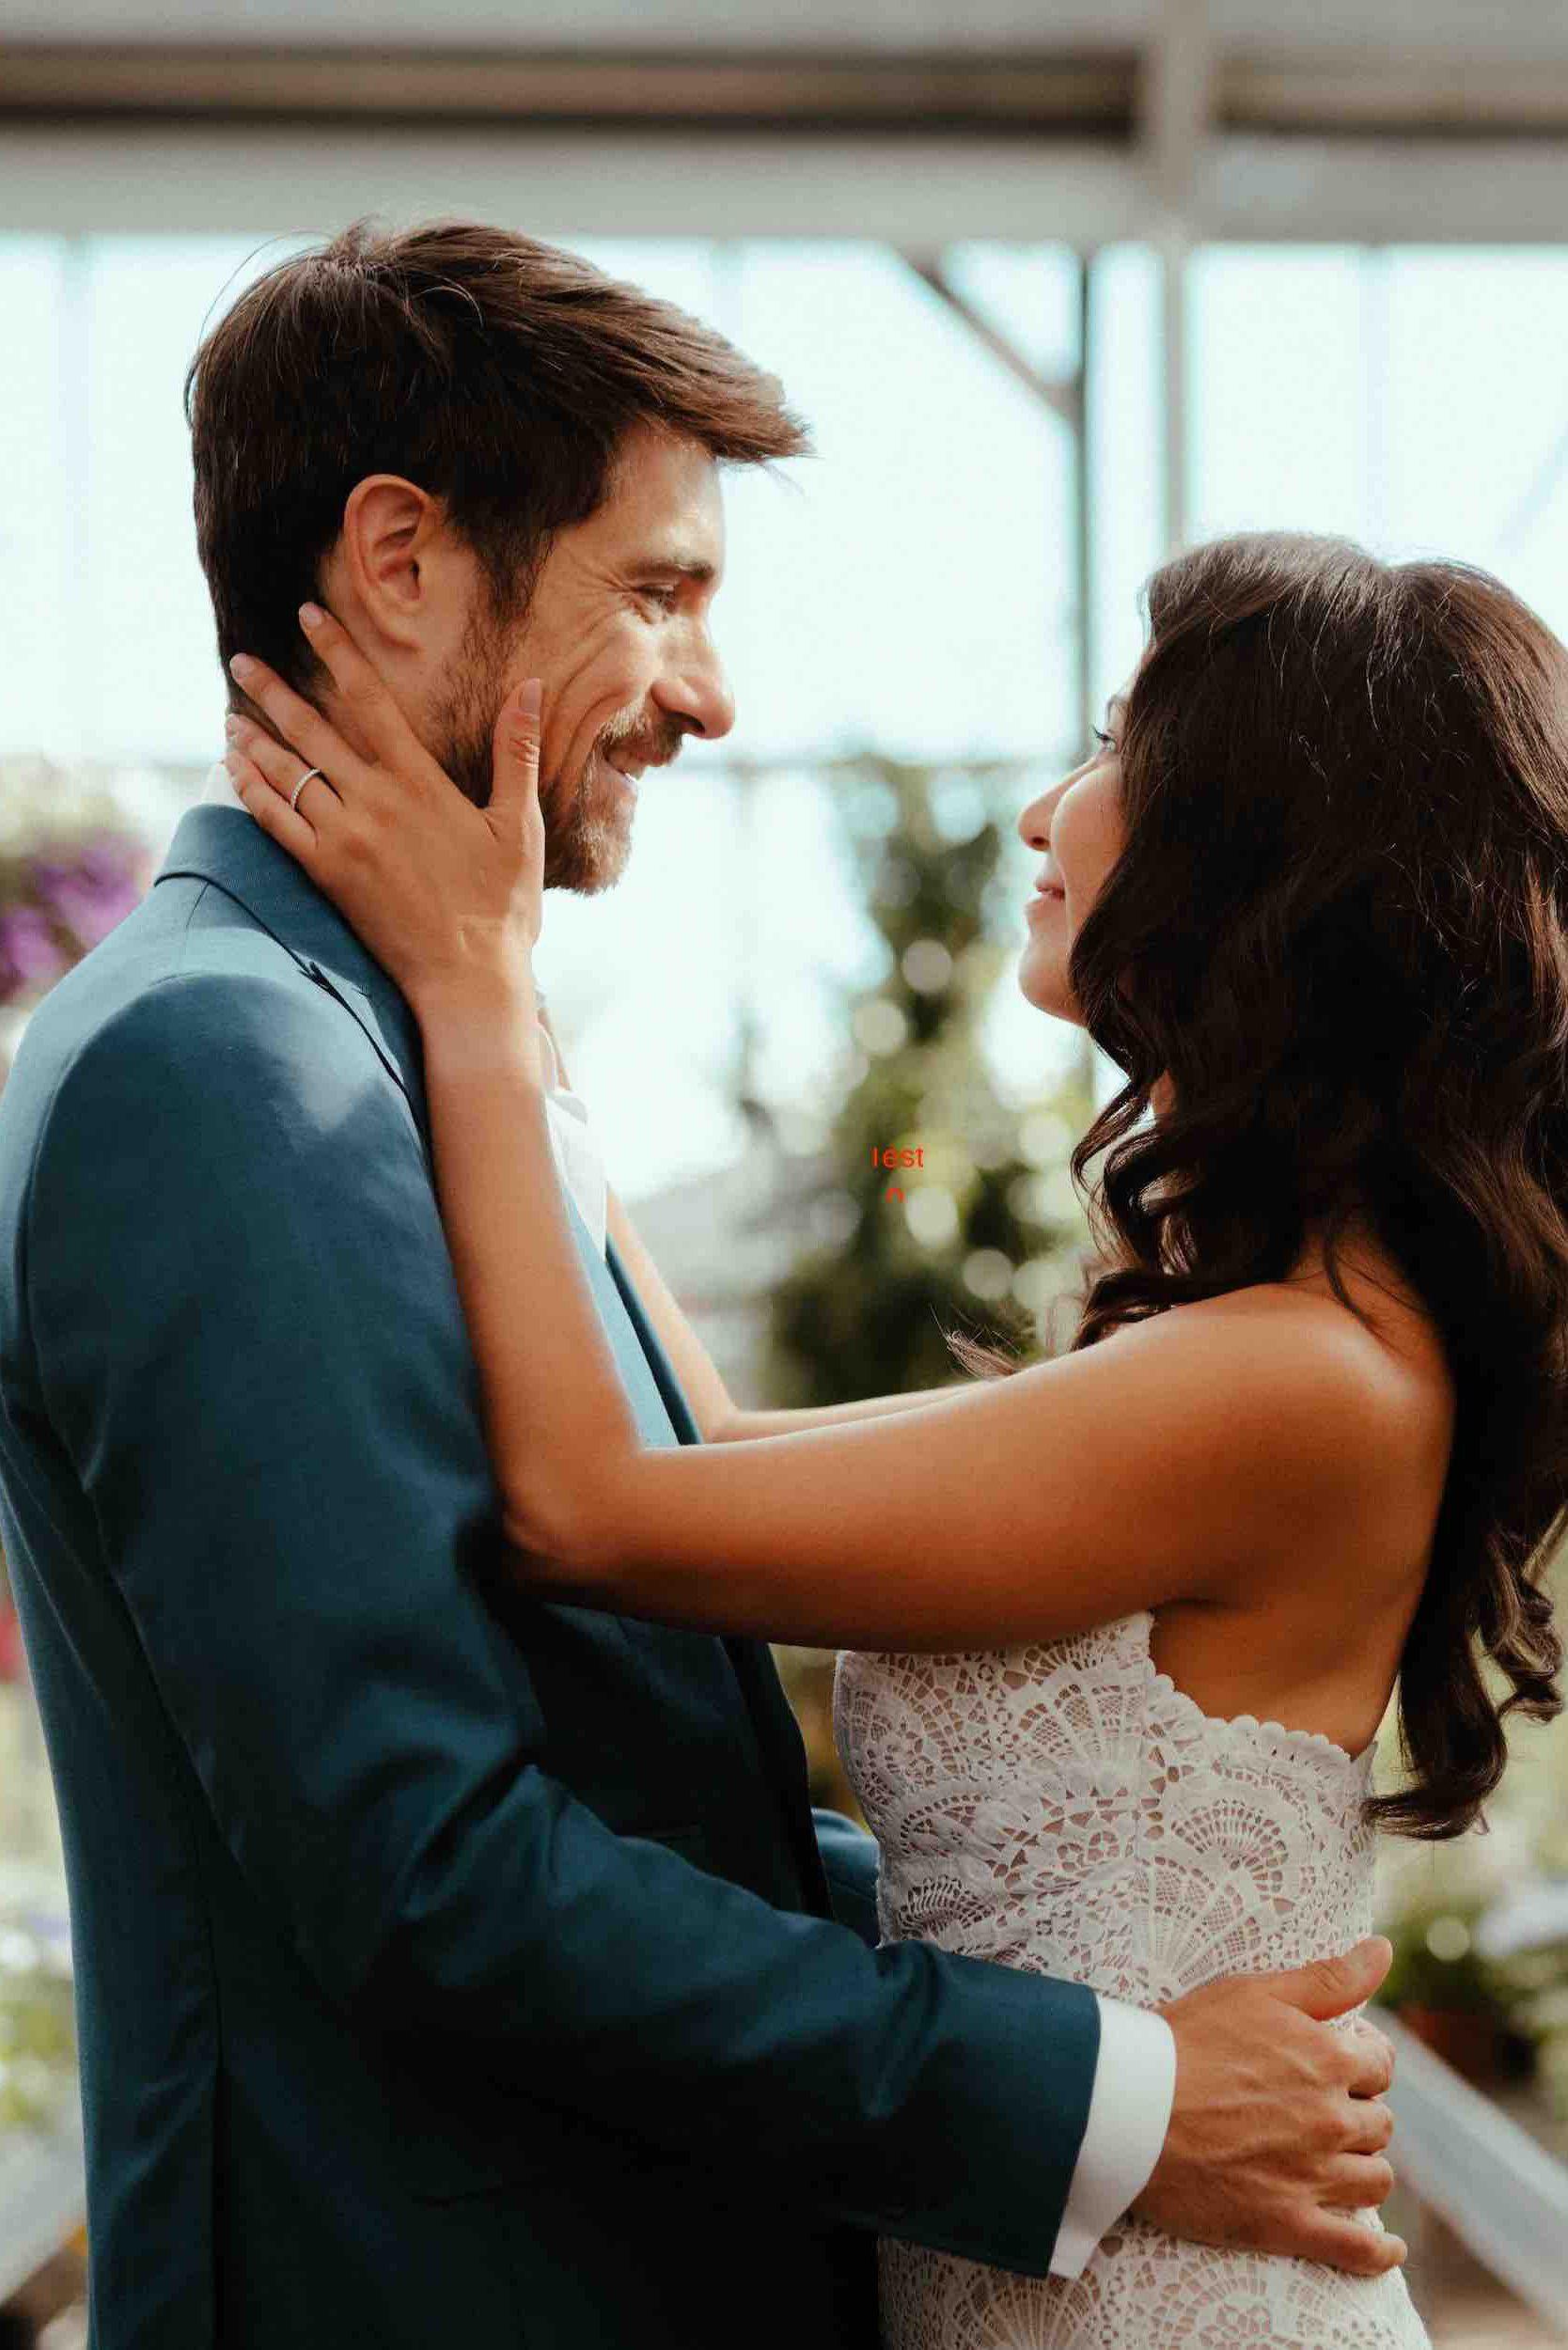 Groom in a Dalbiondo wedding attire with his bride